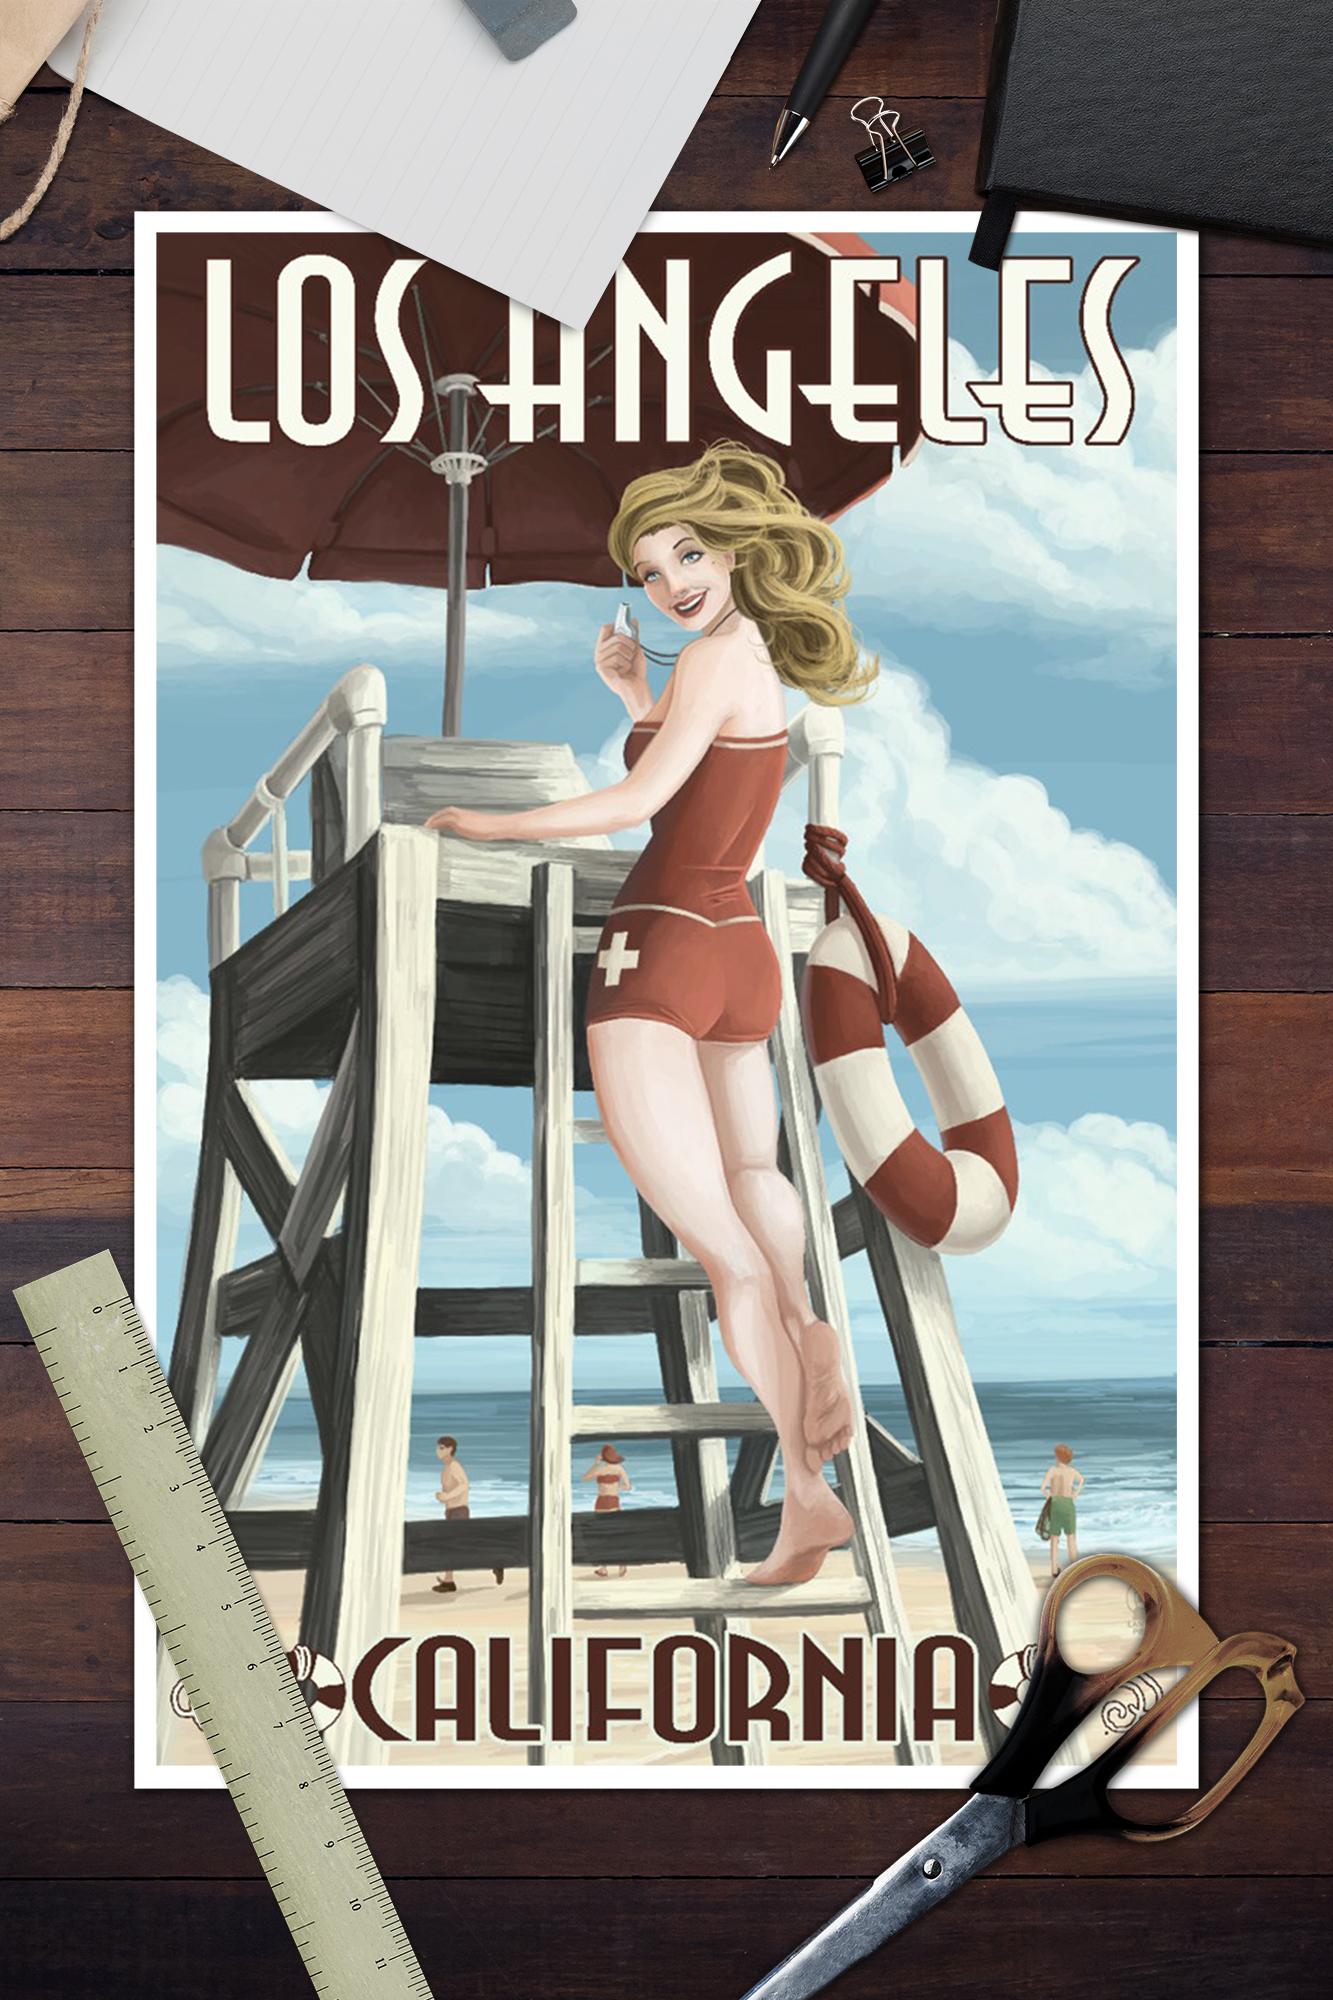 Posters, Wood /& Metal Signs Los Angeles Beach CA Lifeguard Pinup LP Artwork